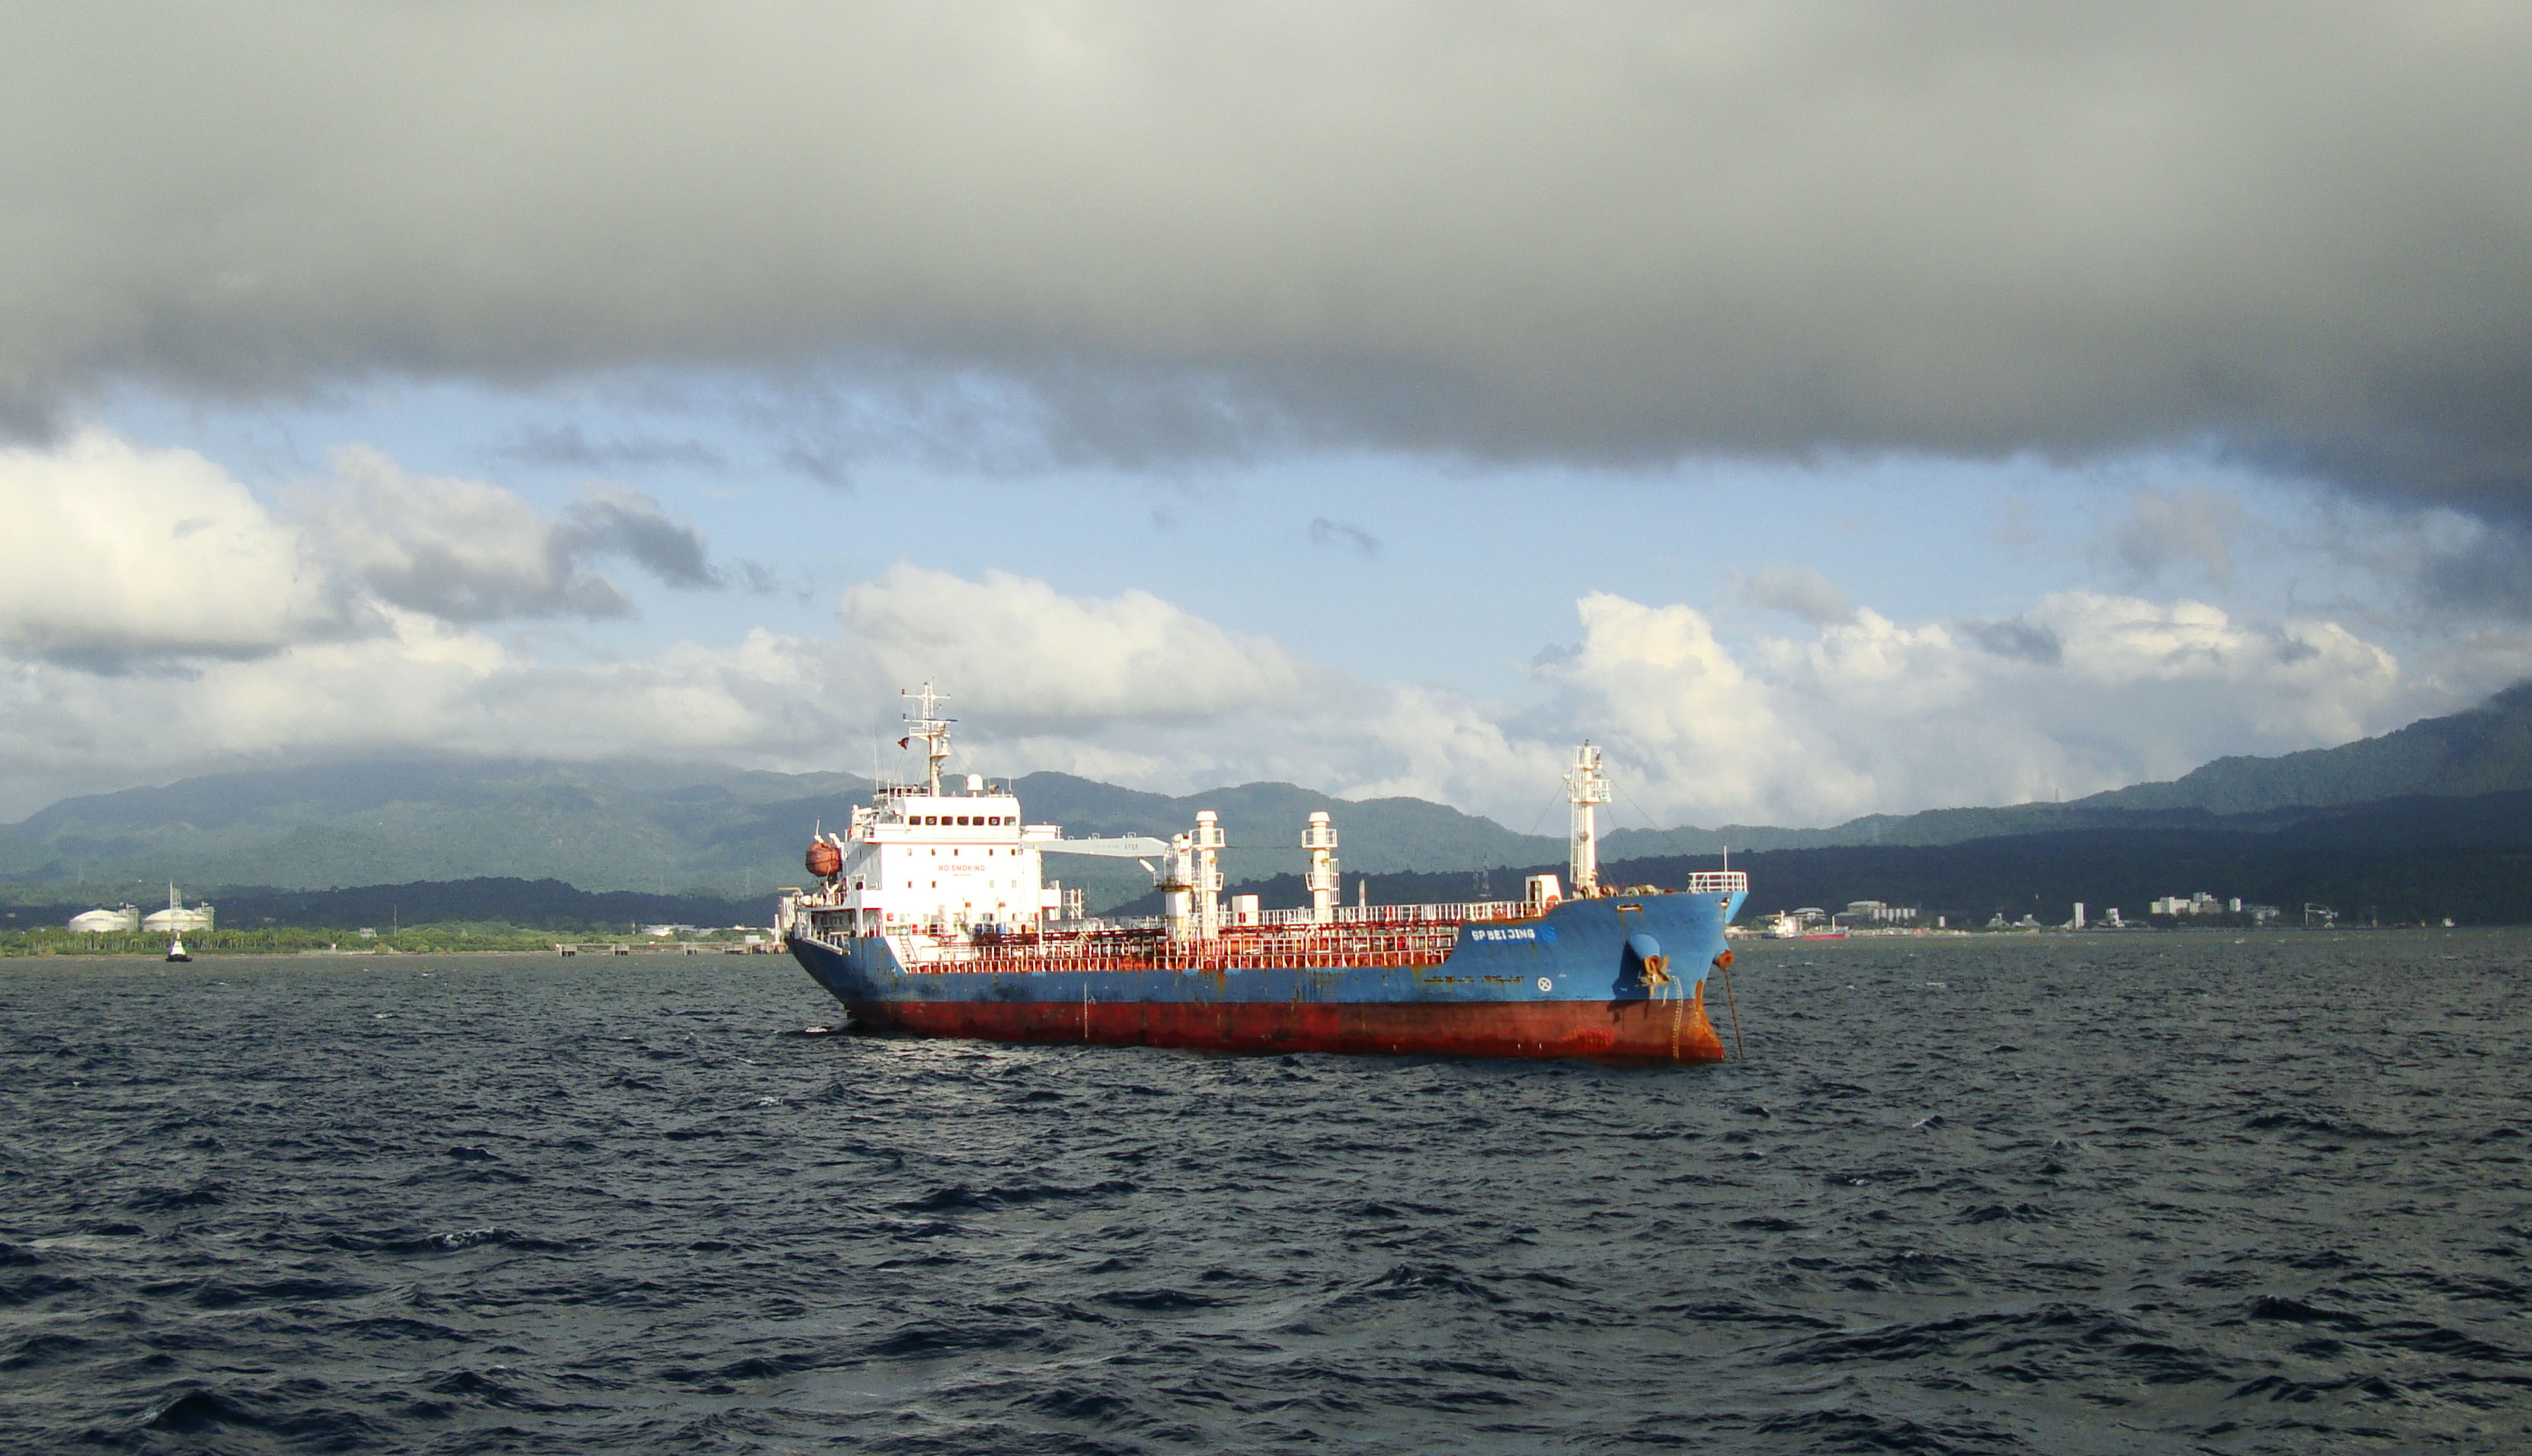 IMO 9471185 Tanker SP Beijing Majuro Batangus Bay Philppines 2010 09